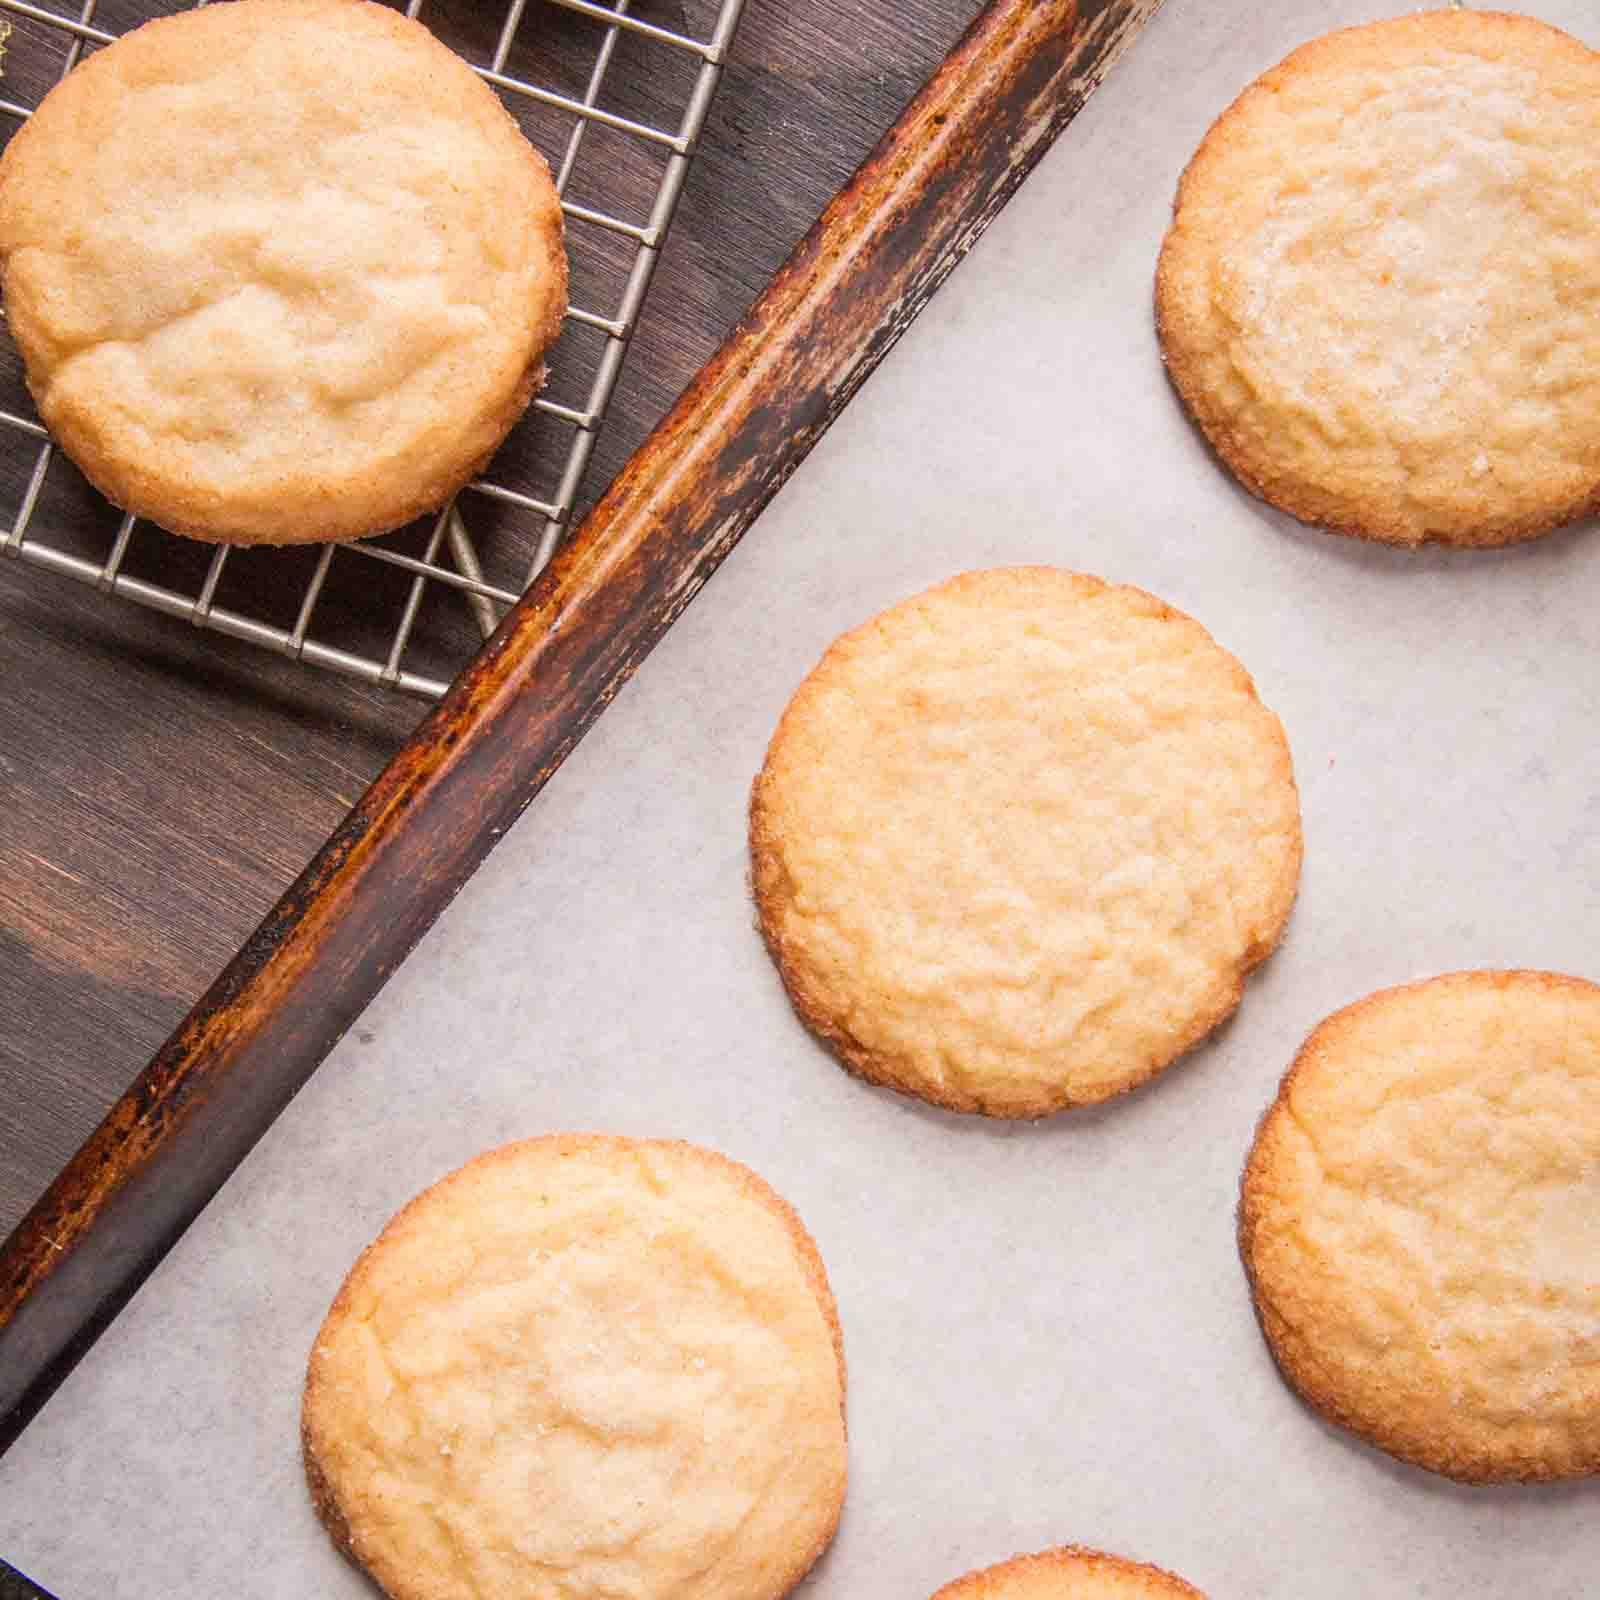 Soft Sugar Cookies on Mesh and Normal Baking Sheets